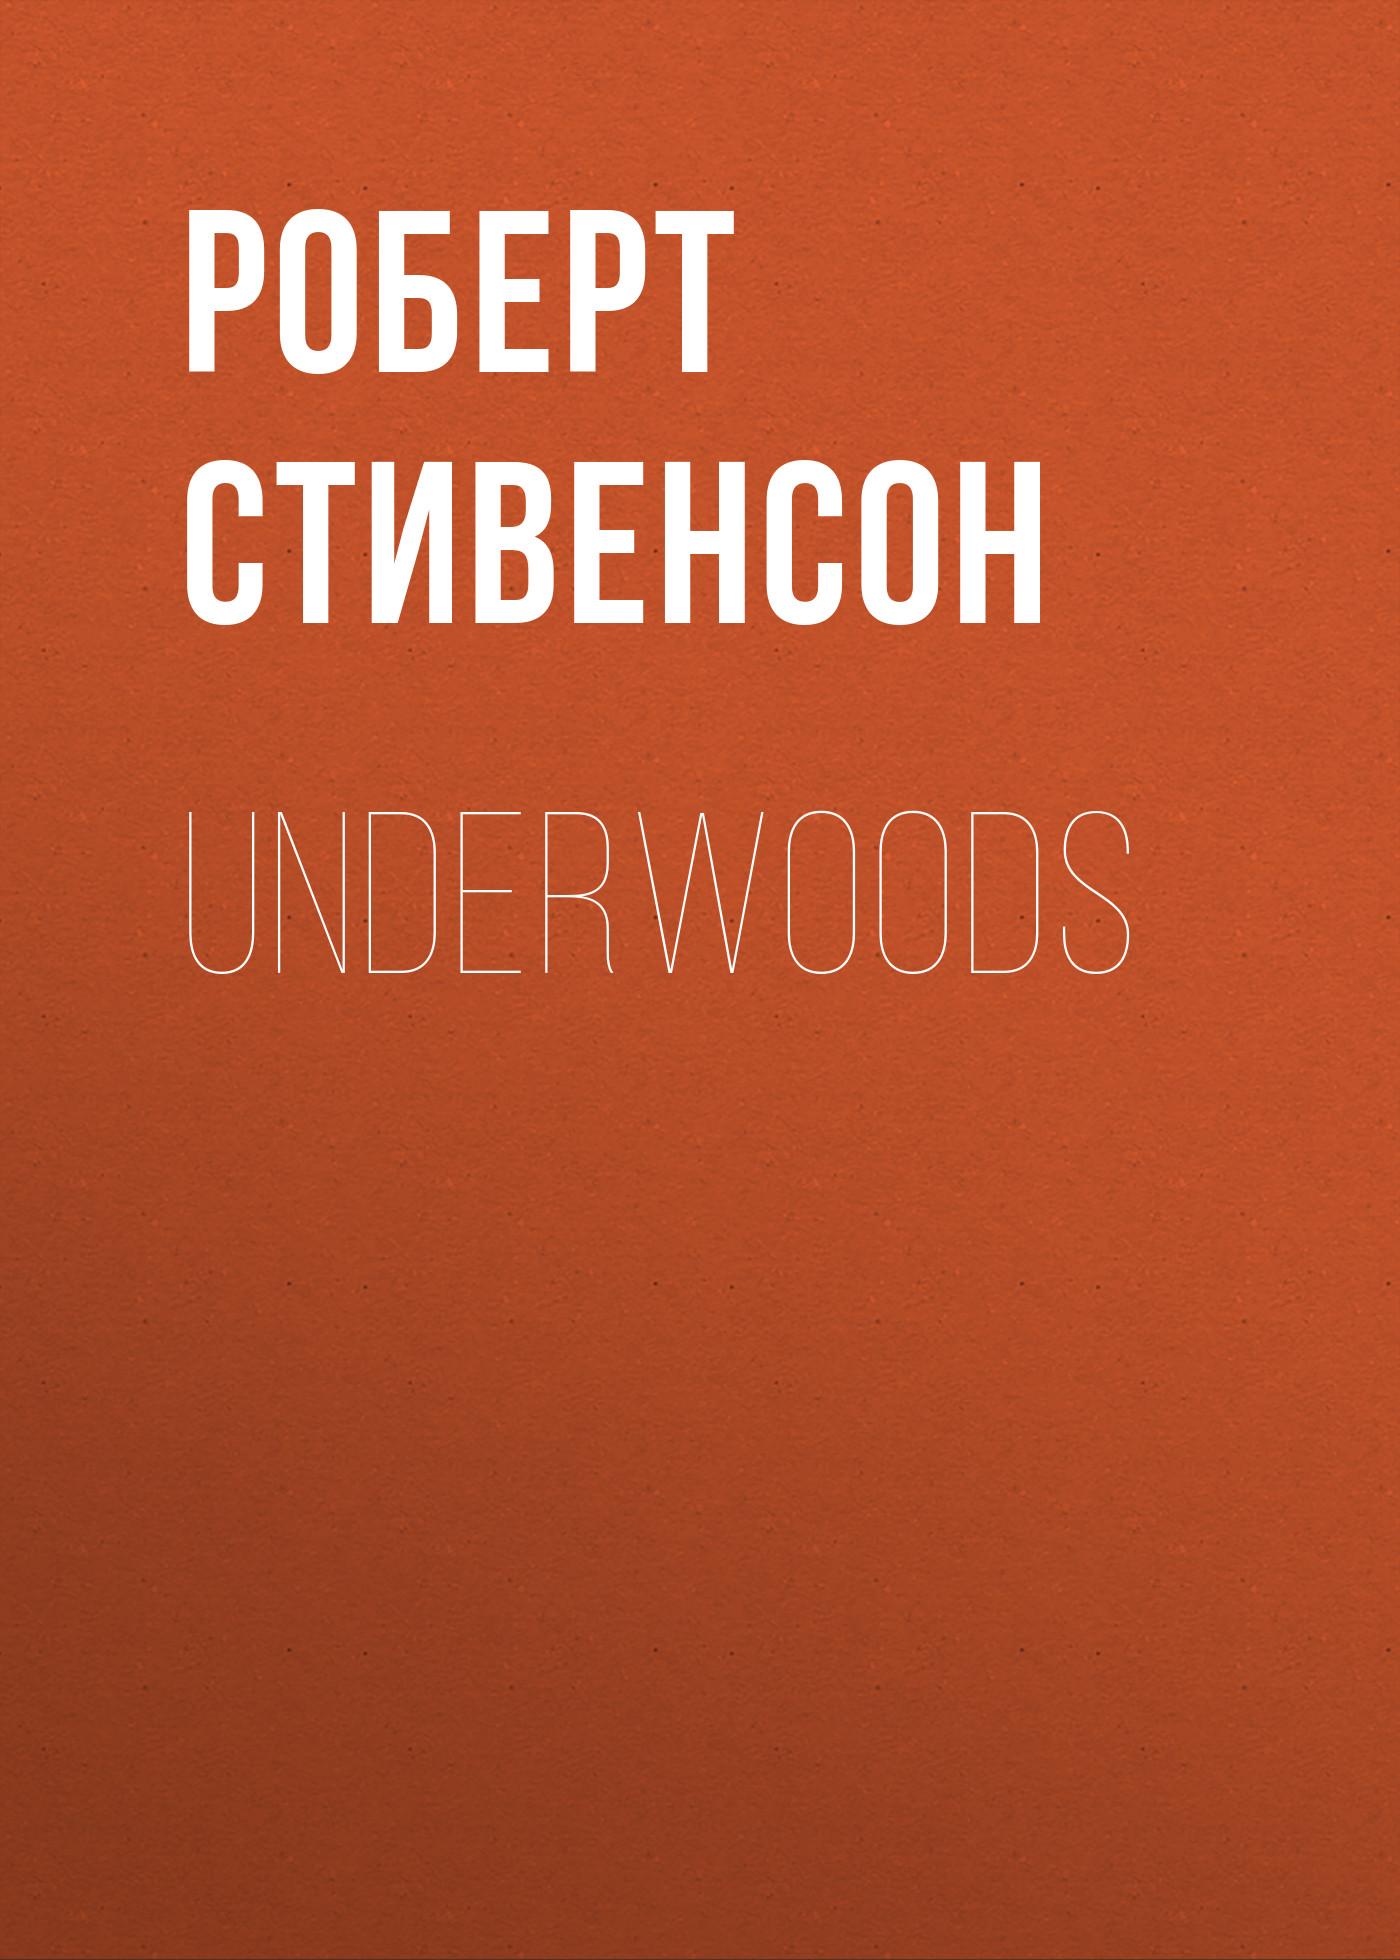 Роберт Льюис Стивенсон Underwoods роберт льюис стивенсон tales and fantasies